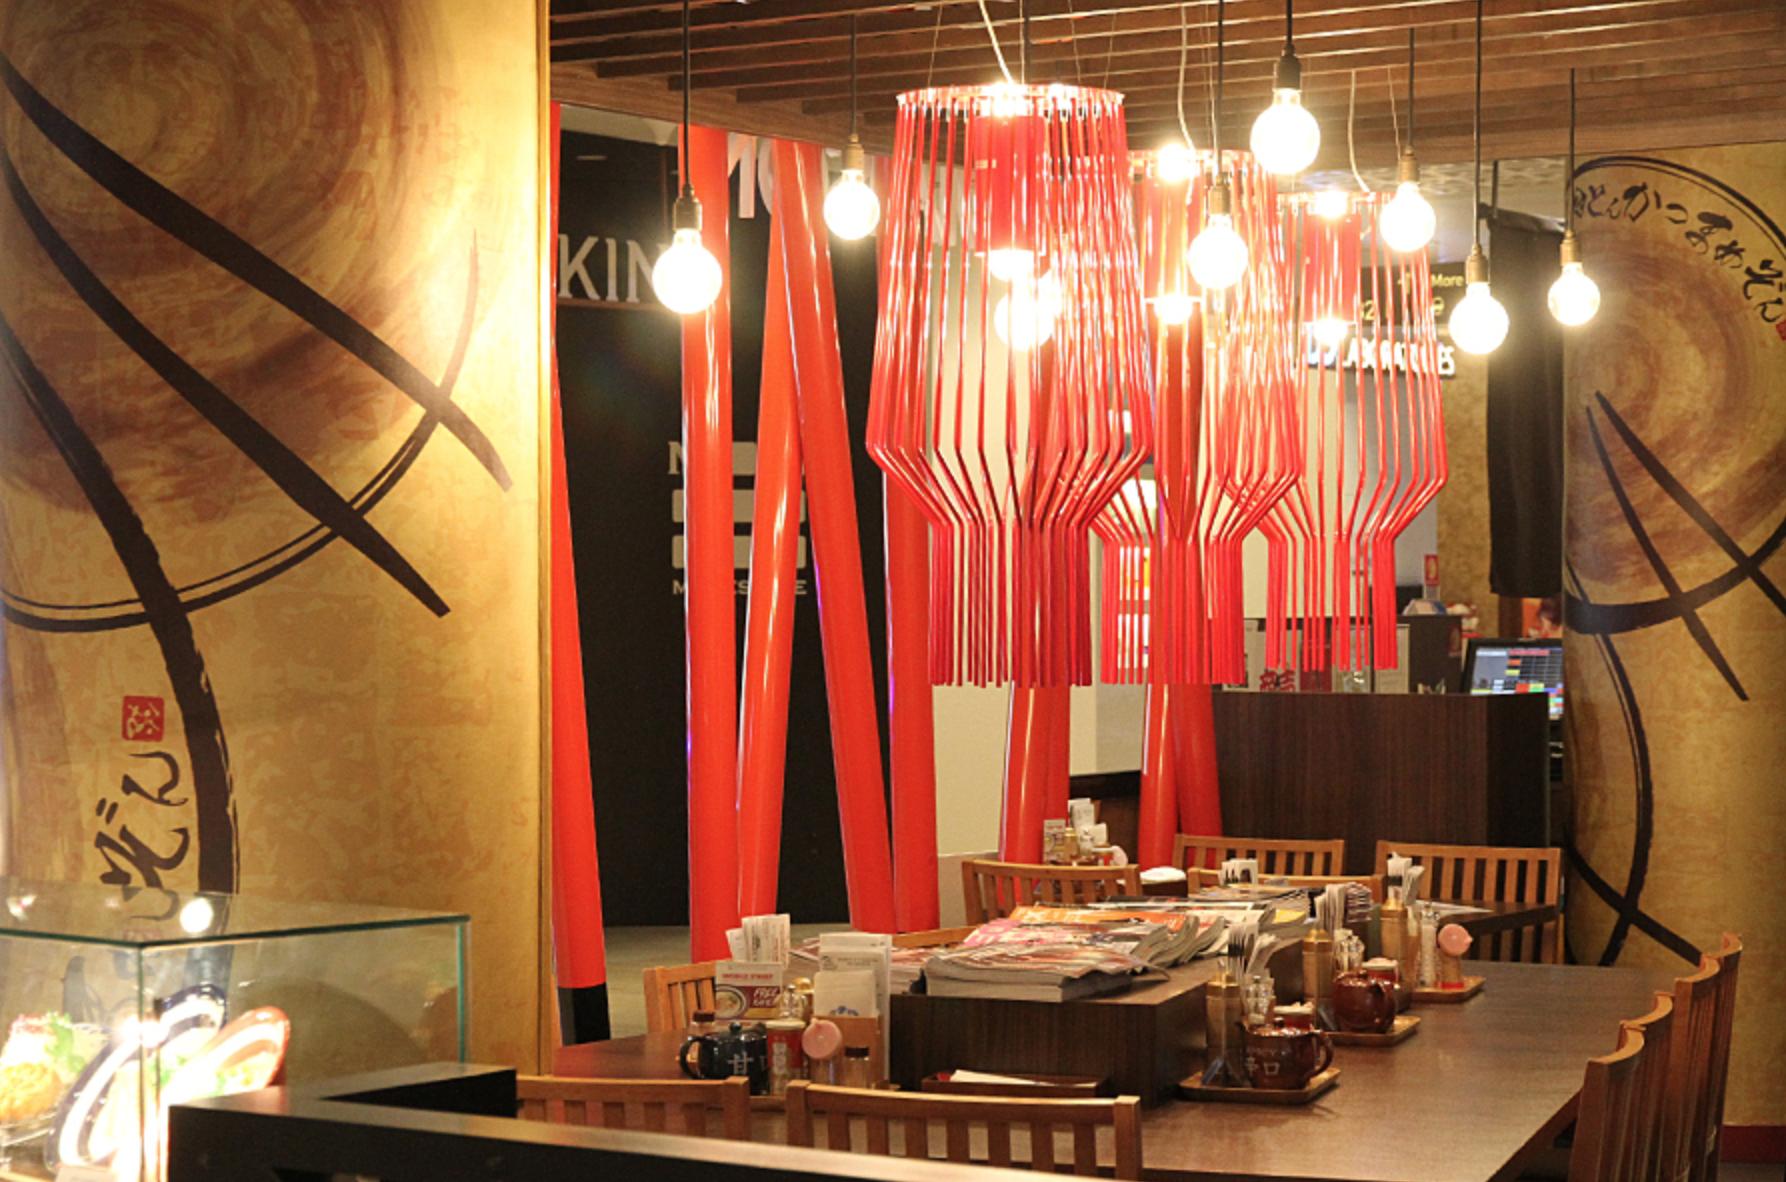 9 Restaurants in Capitol Singapore for a Romantic Valentine's Day Celebration - Alvinology